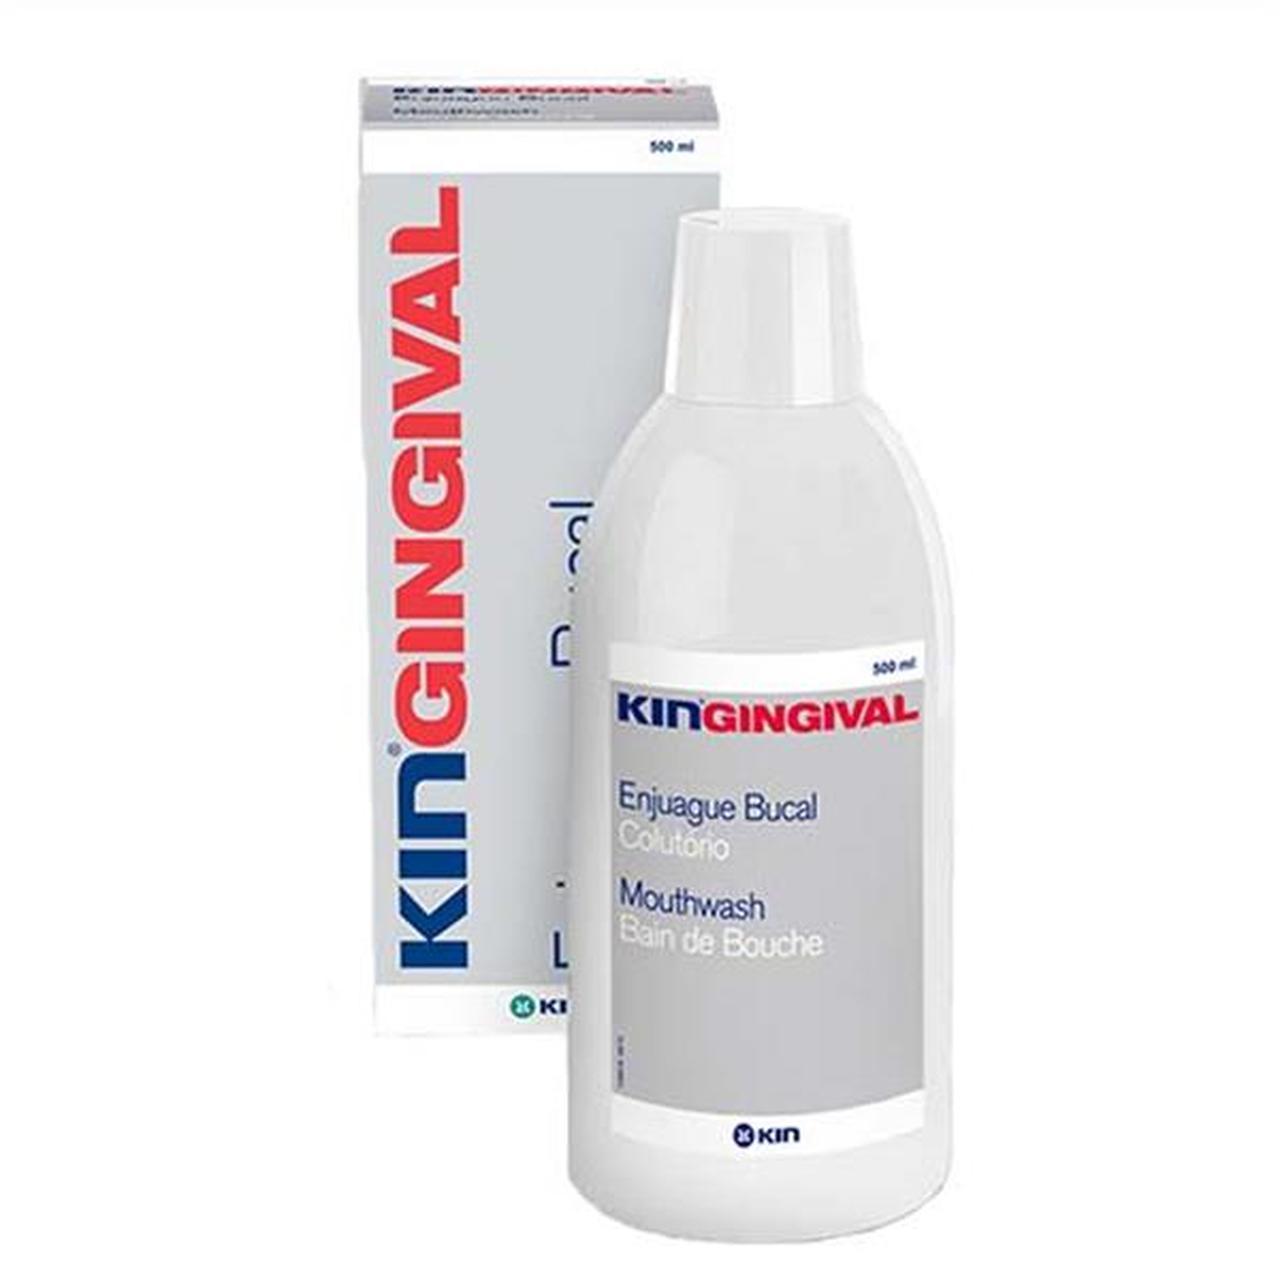 KIN GINGIVAL MOUTHWASH